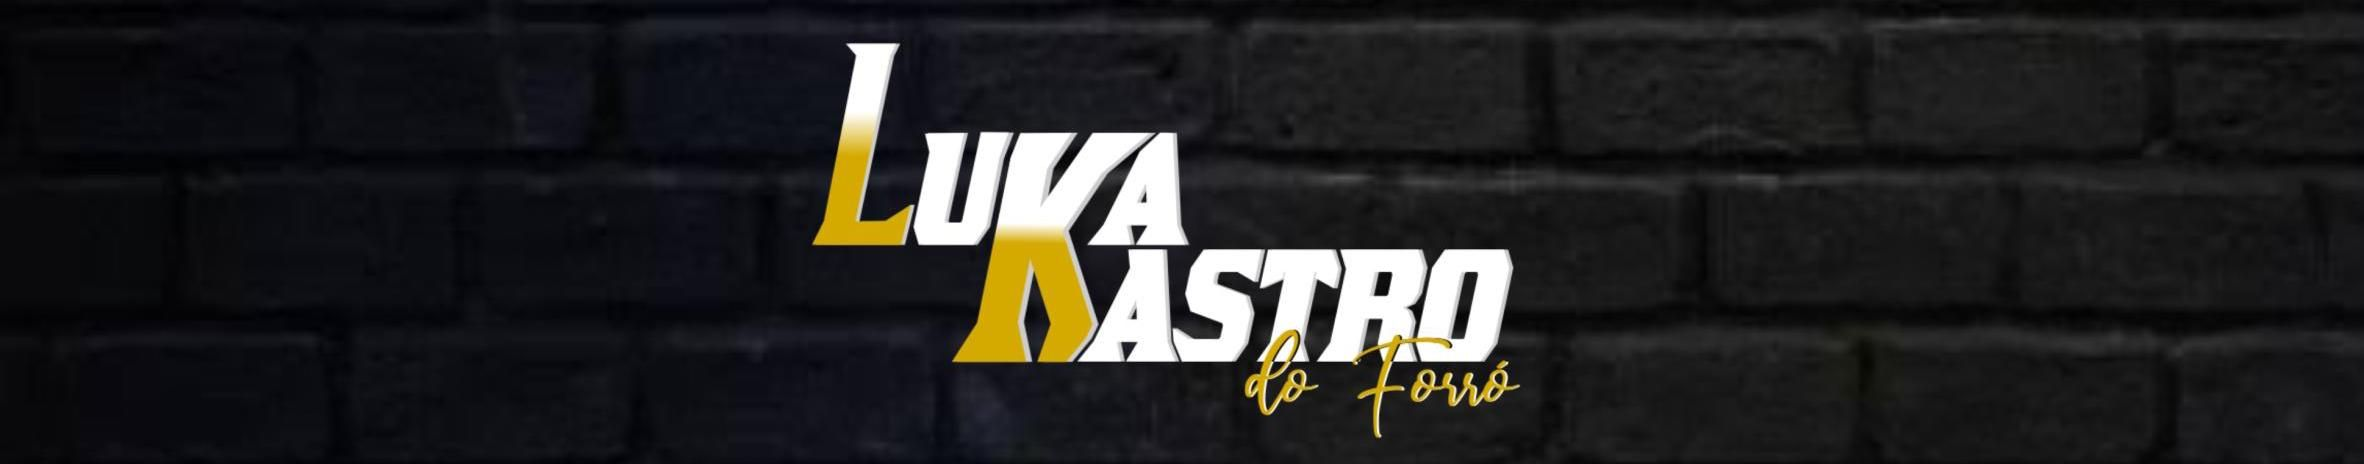 Imagem de capa de LUKA KASTRO DO FORRÓ